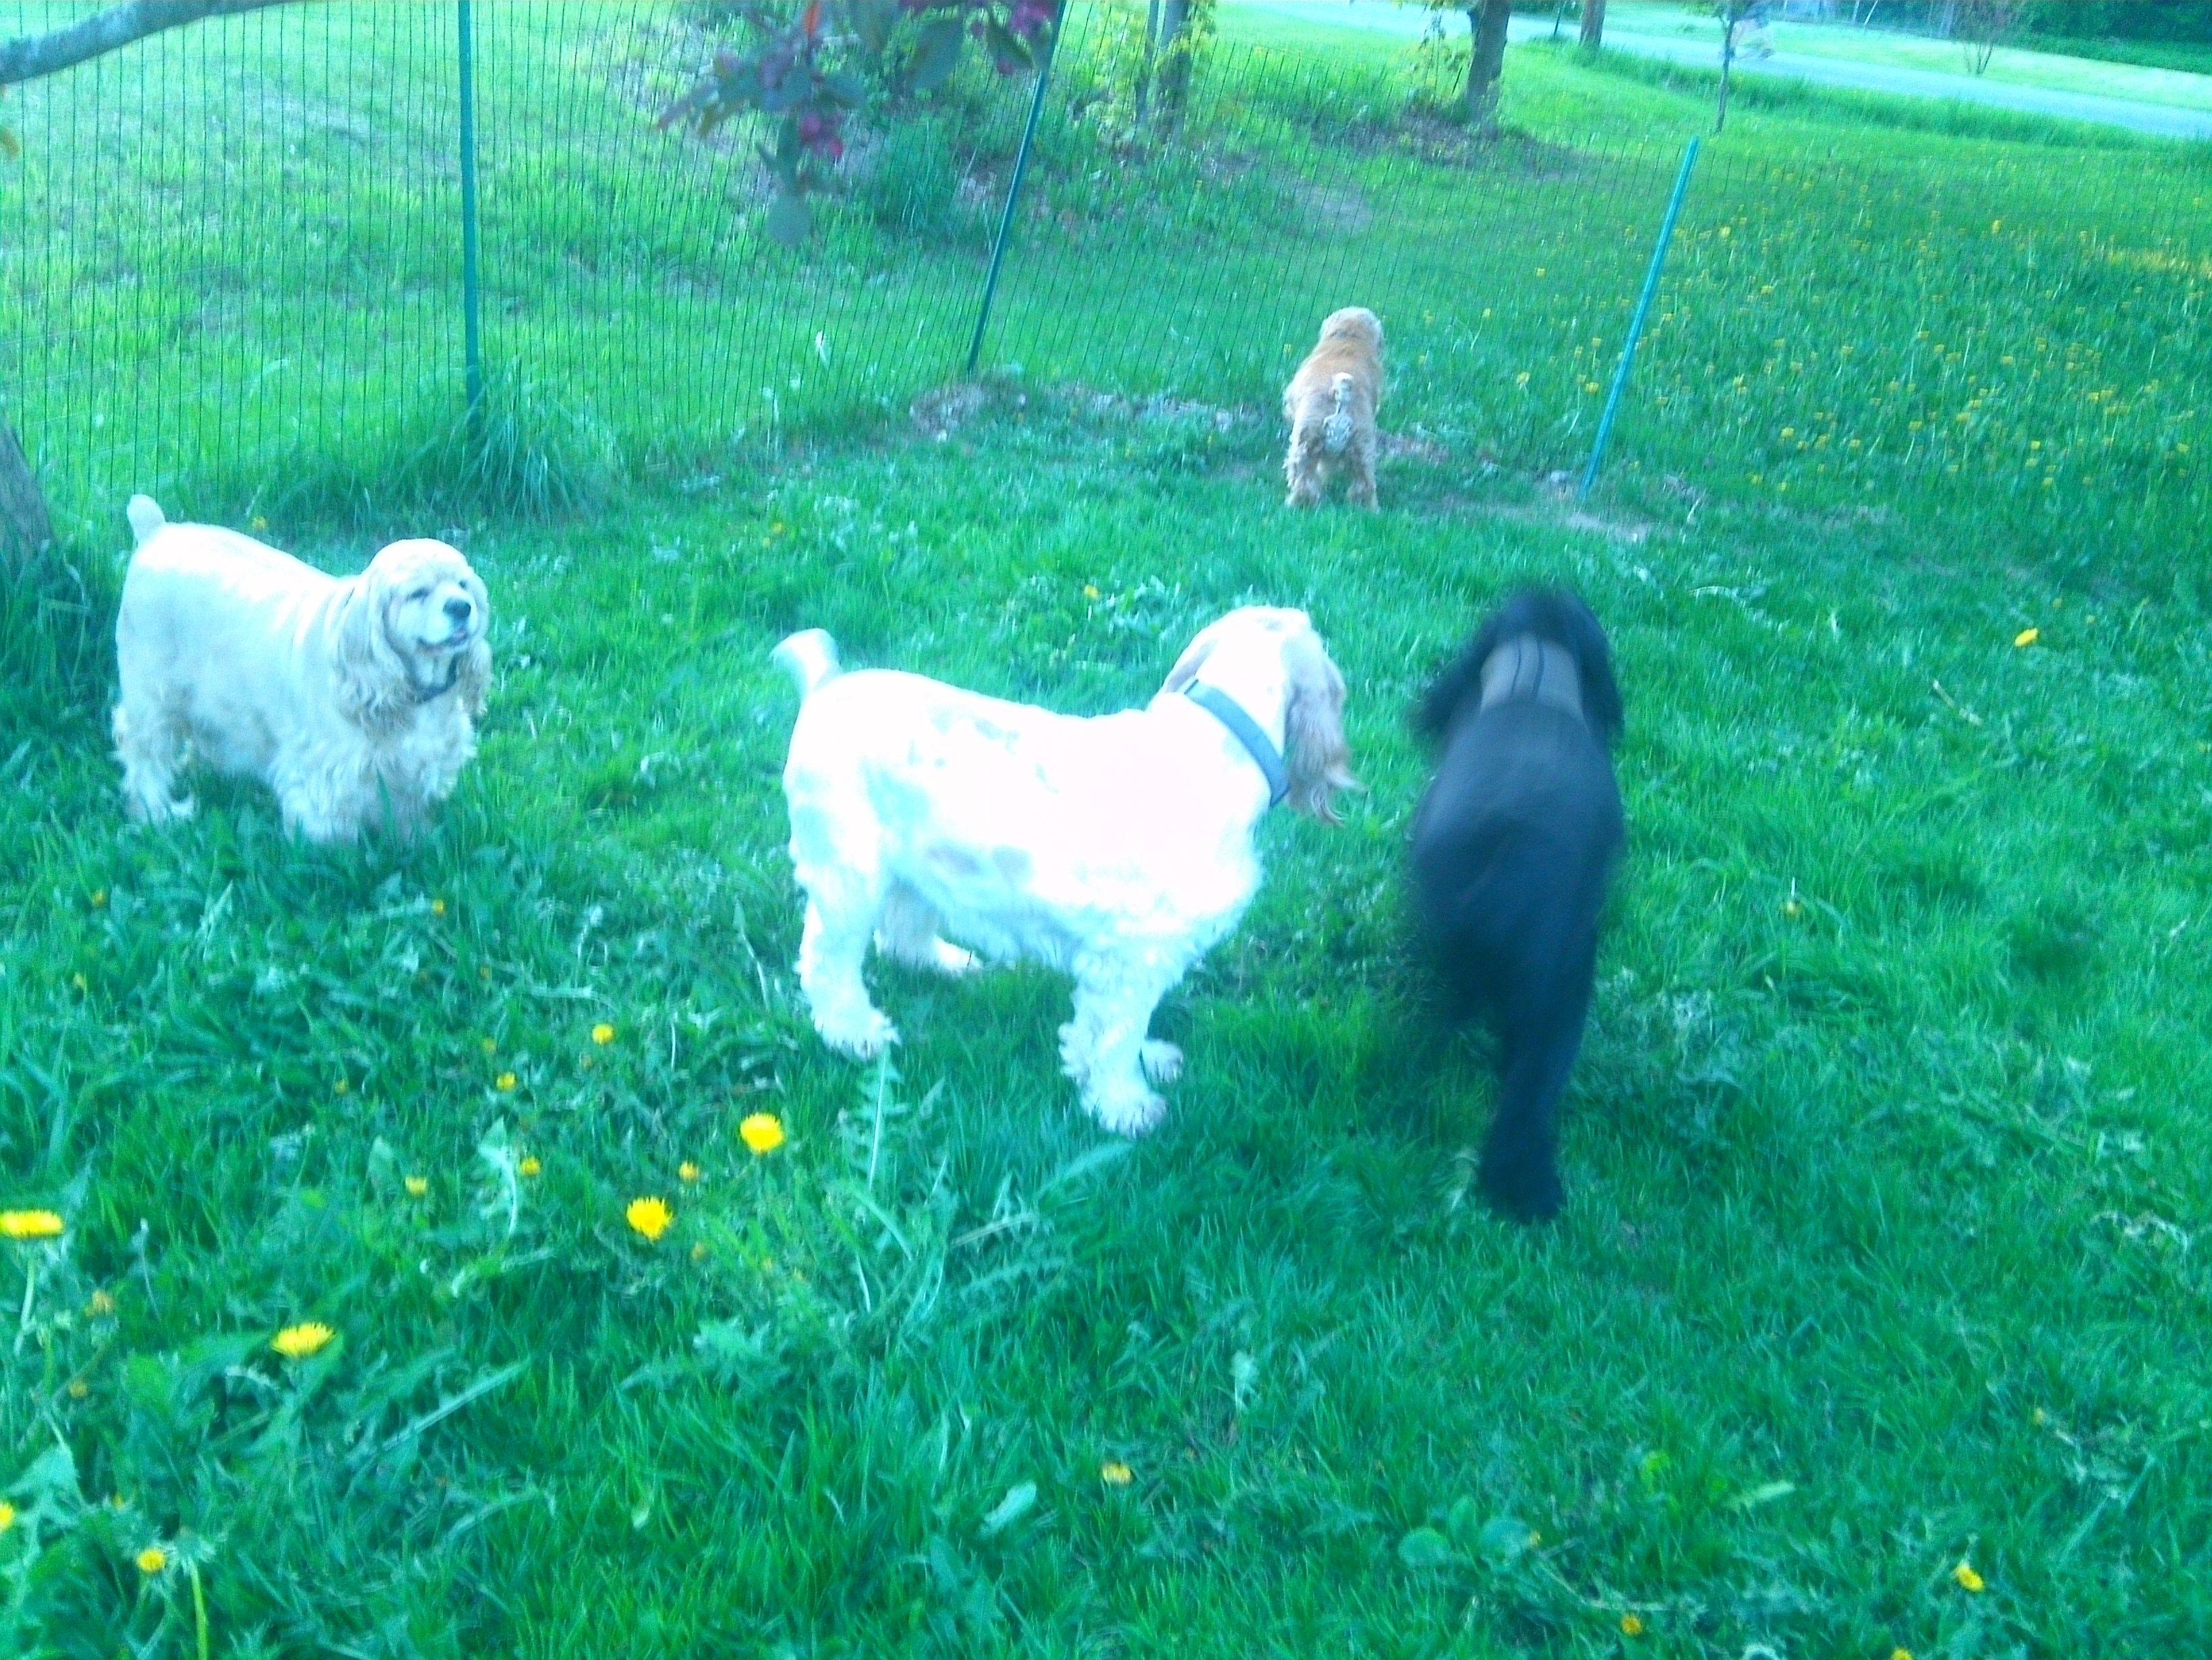 Yard time, enjoying the green grass